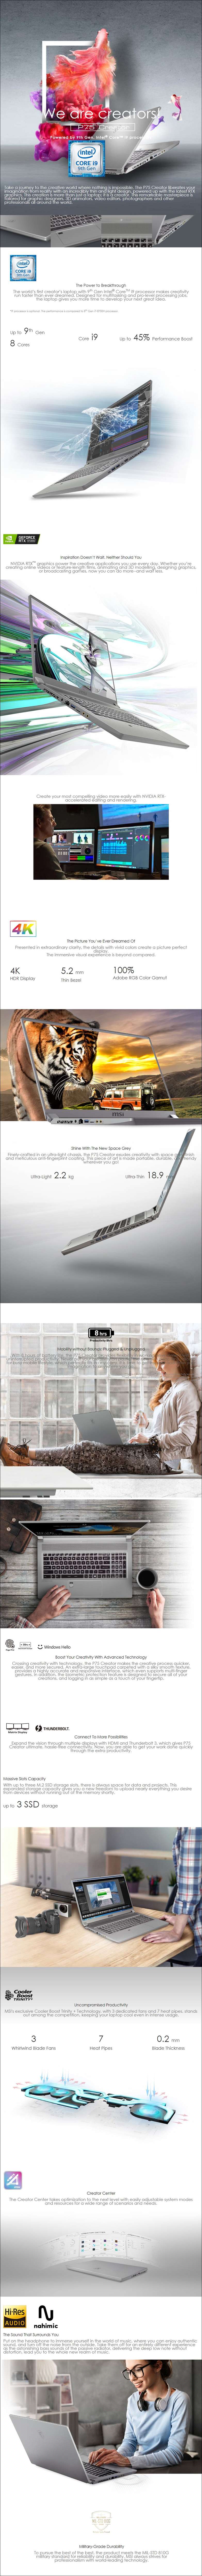 "MSI P75 Creator 9SF 17.3"" 4K Laptop i9-9880H 32GB 1TB RTX2070 W10P - Overview 1"